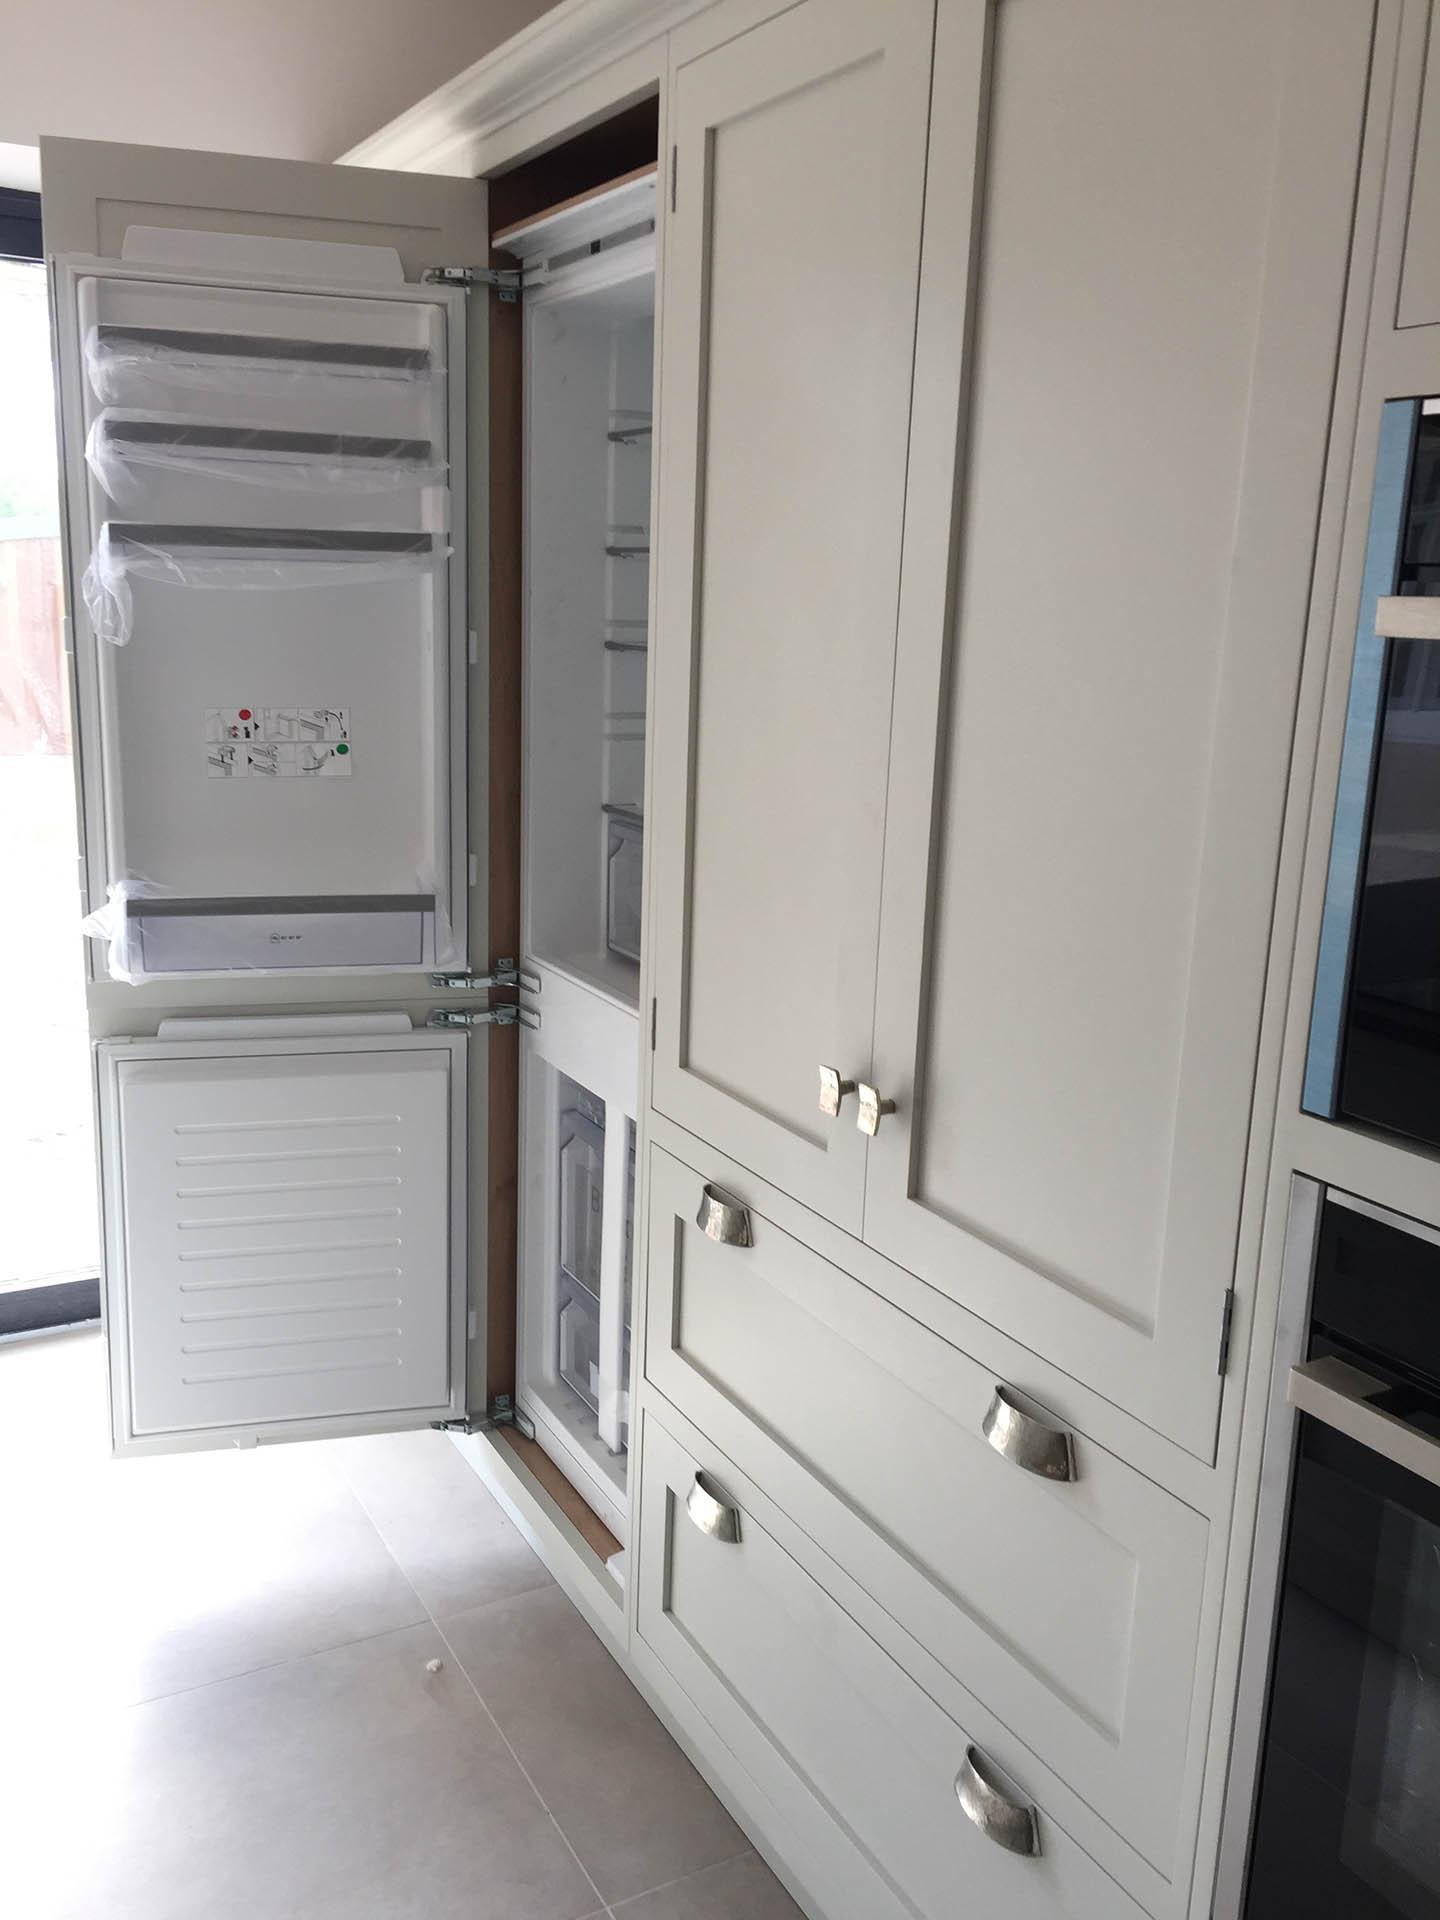 A kitchen fridge with bespoke facade.